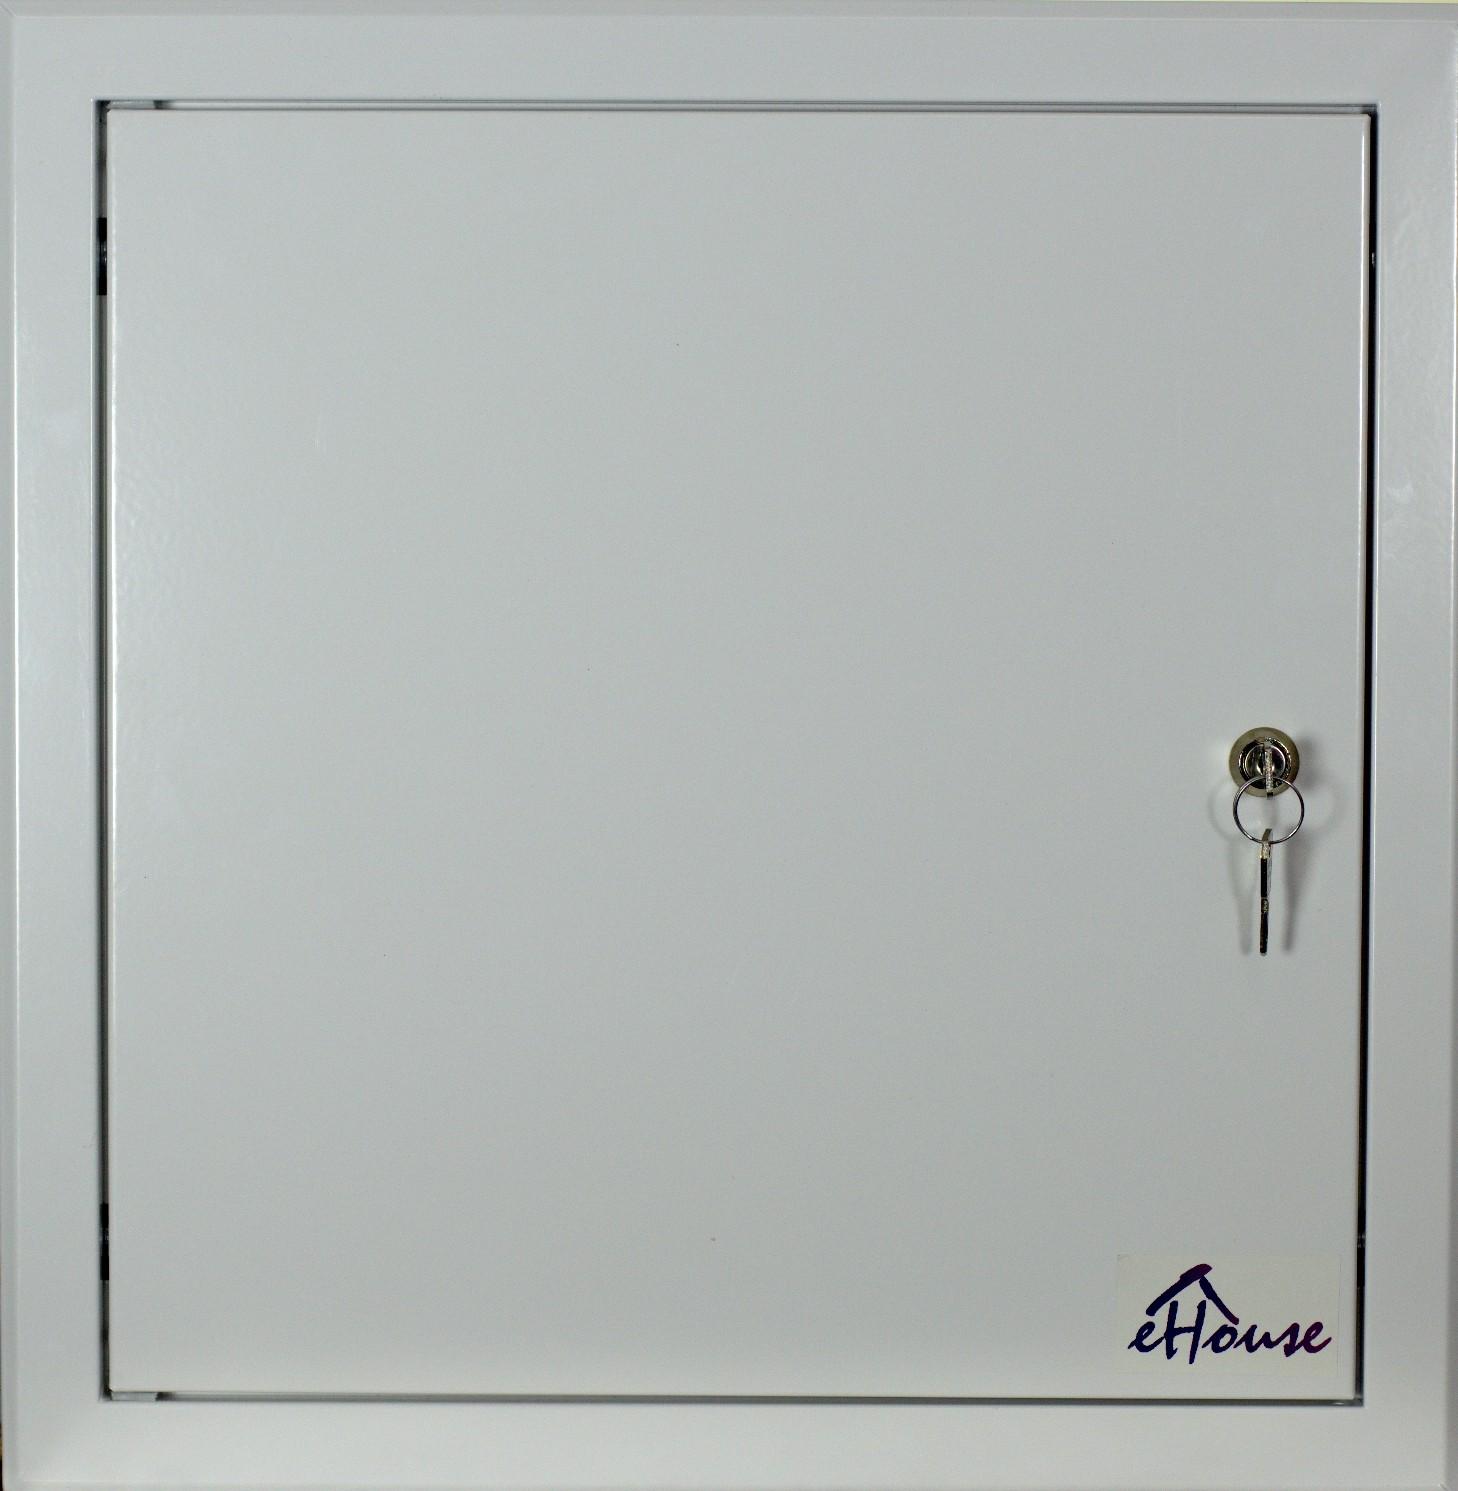 Images for inteligentny-dom-econo (eHouse)